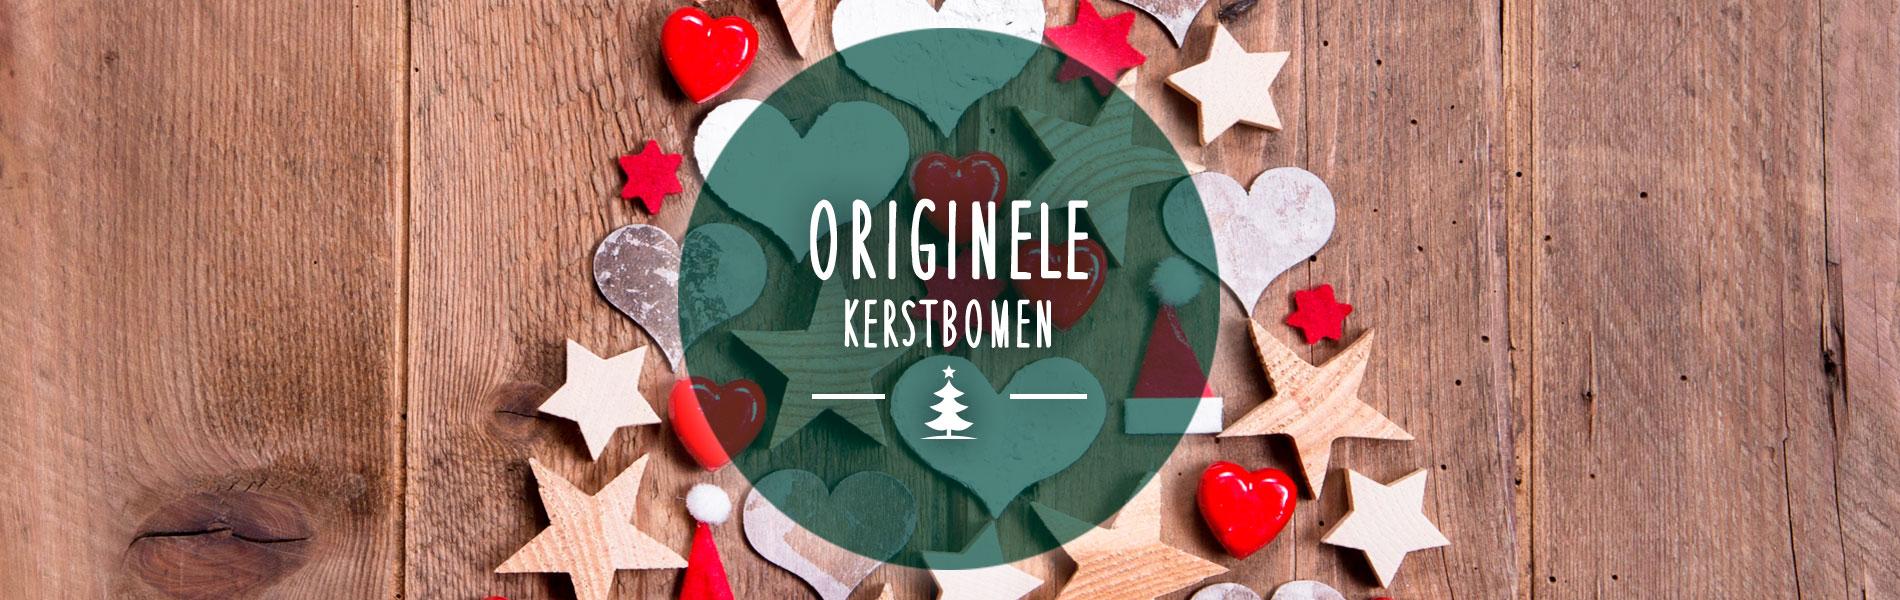 Christmas-Trees_Top-bnr_NL2